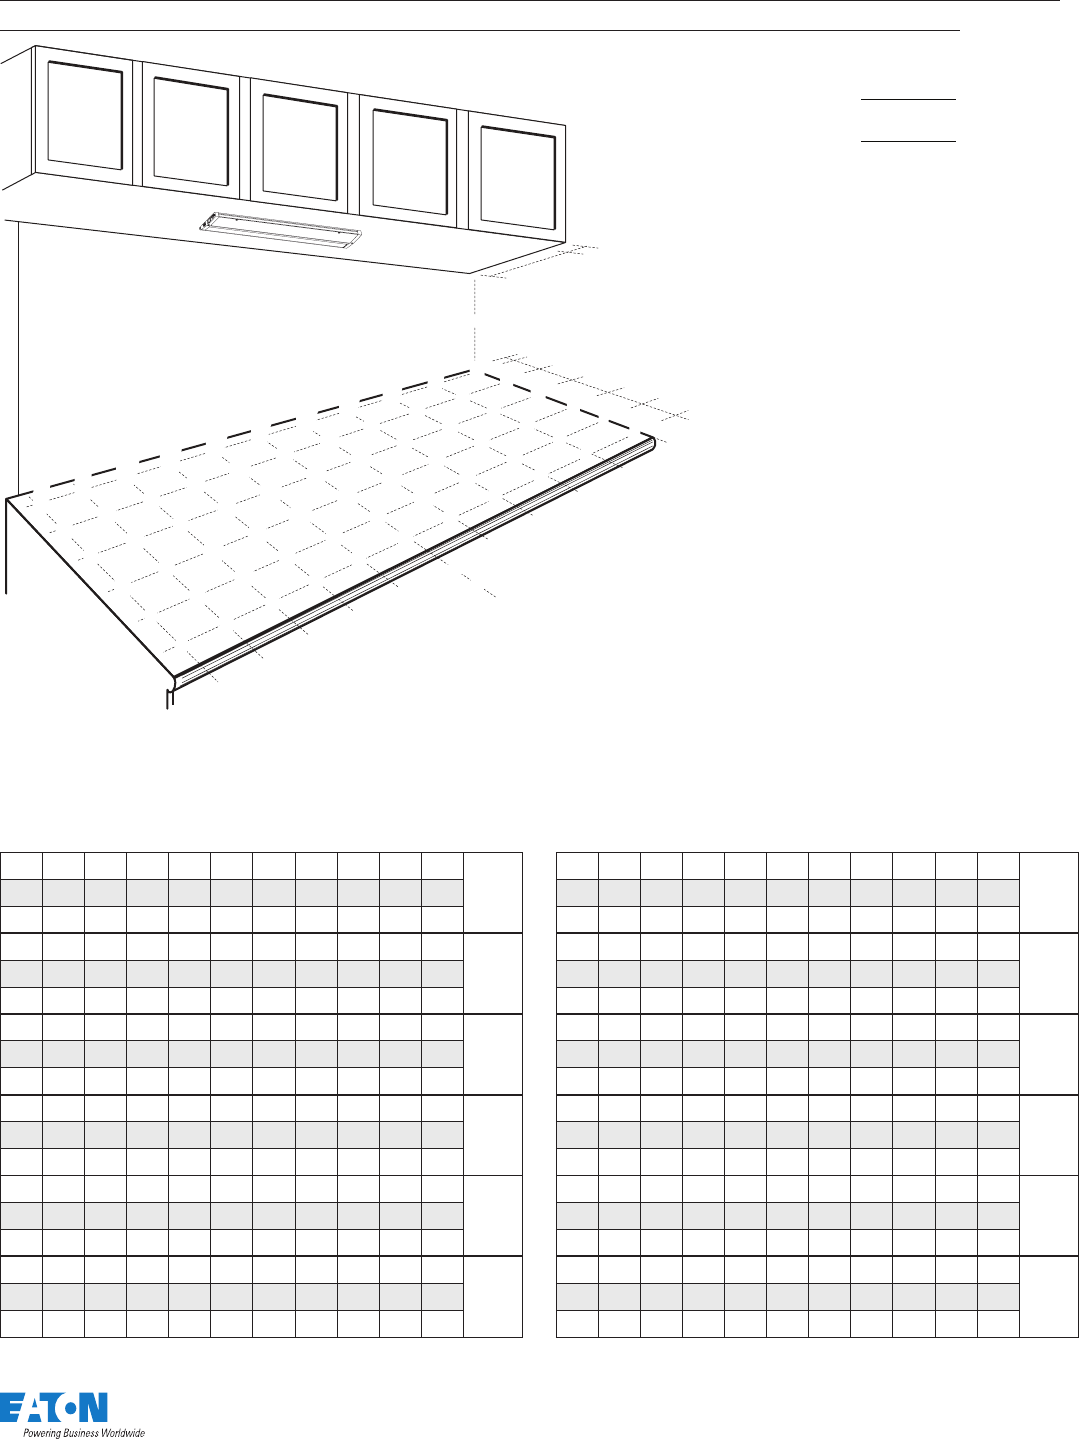 Halo HU10 Undercabinet Spec Sheet TD518002EN, LED, HU10, Halo Hu Under Cabinet Wiring Diagram on